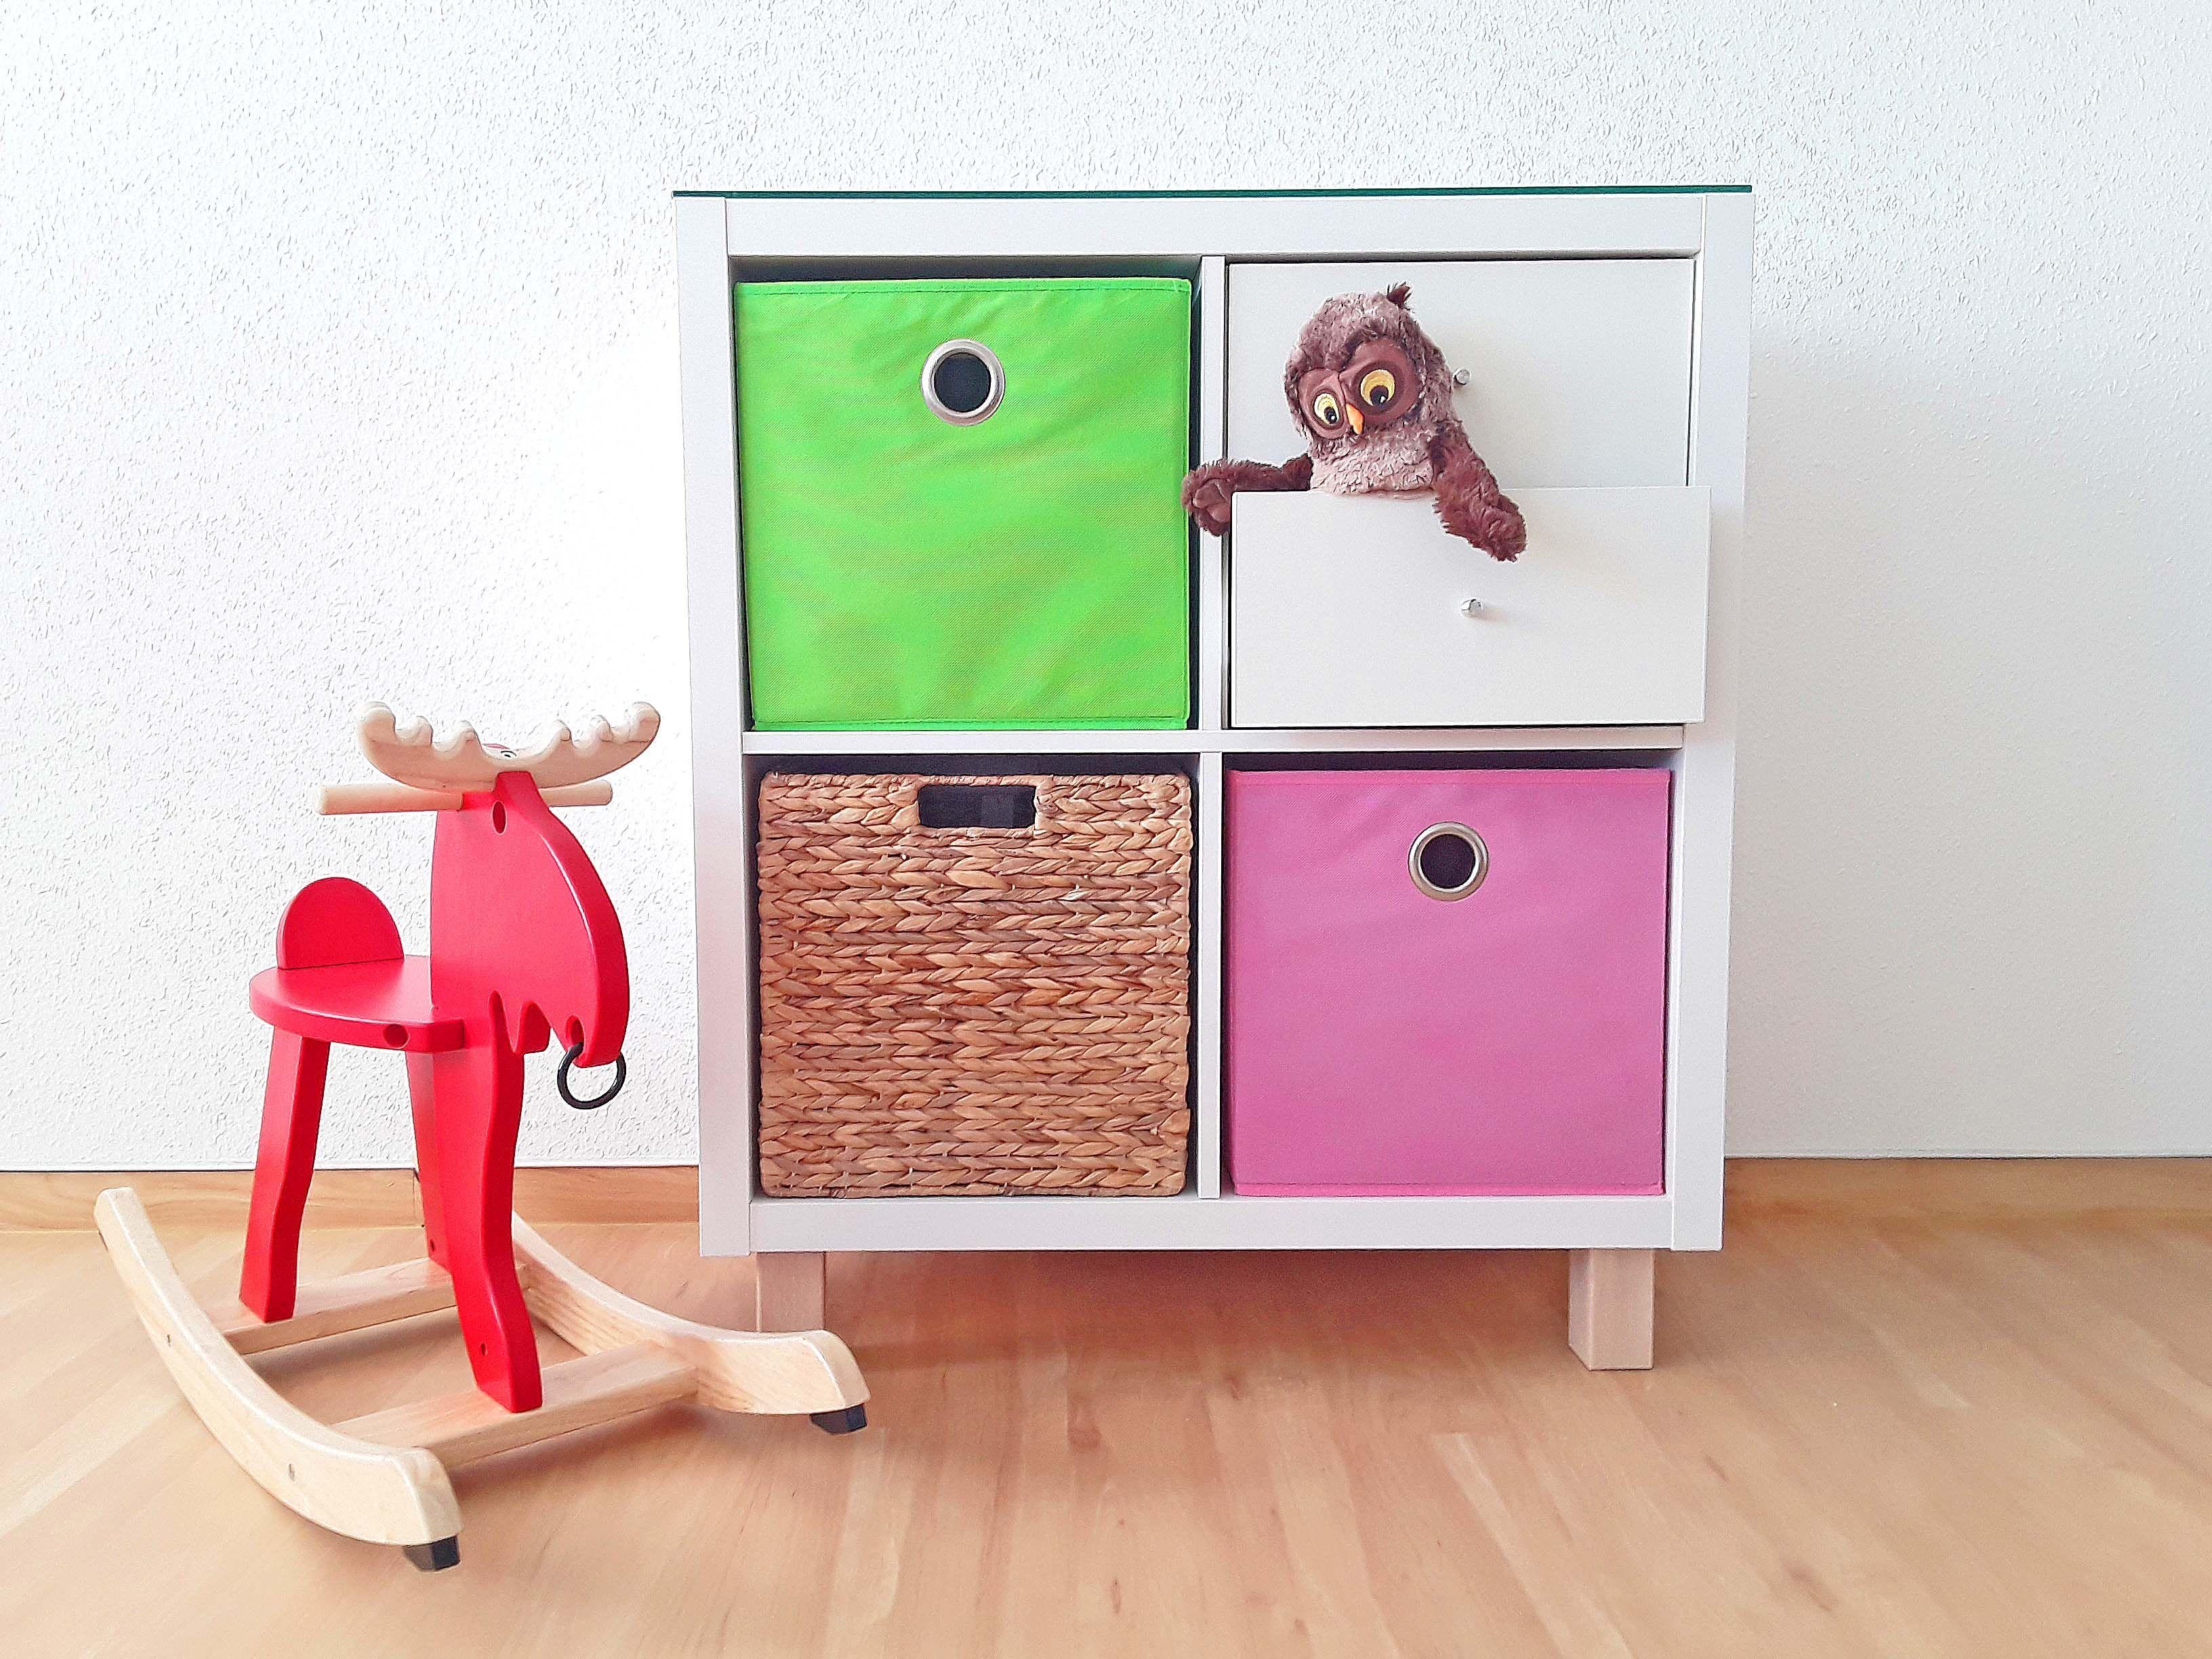 oskar kallax regal pimps pinterest kallax regal regal und kinderzimmer. Black Bedroom Furniture Sets. Home Design Ideas